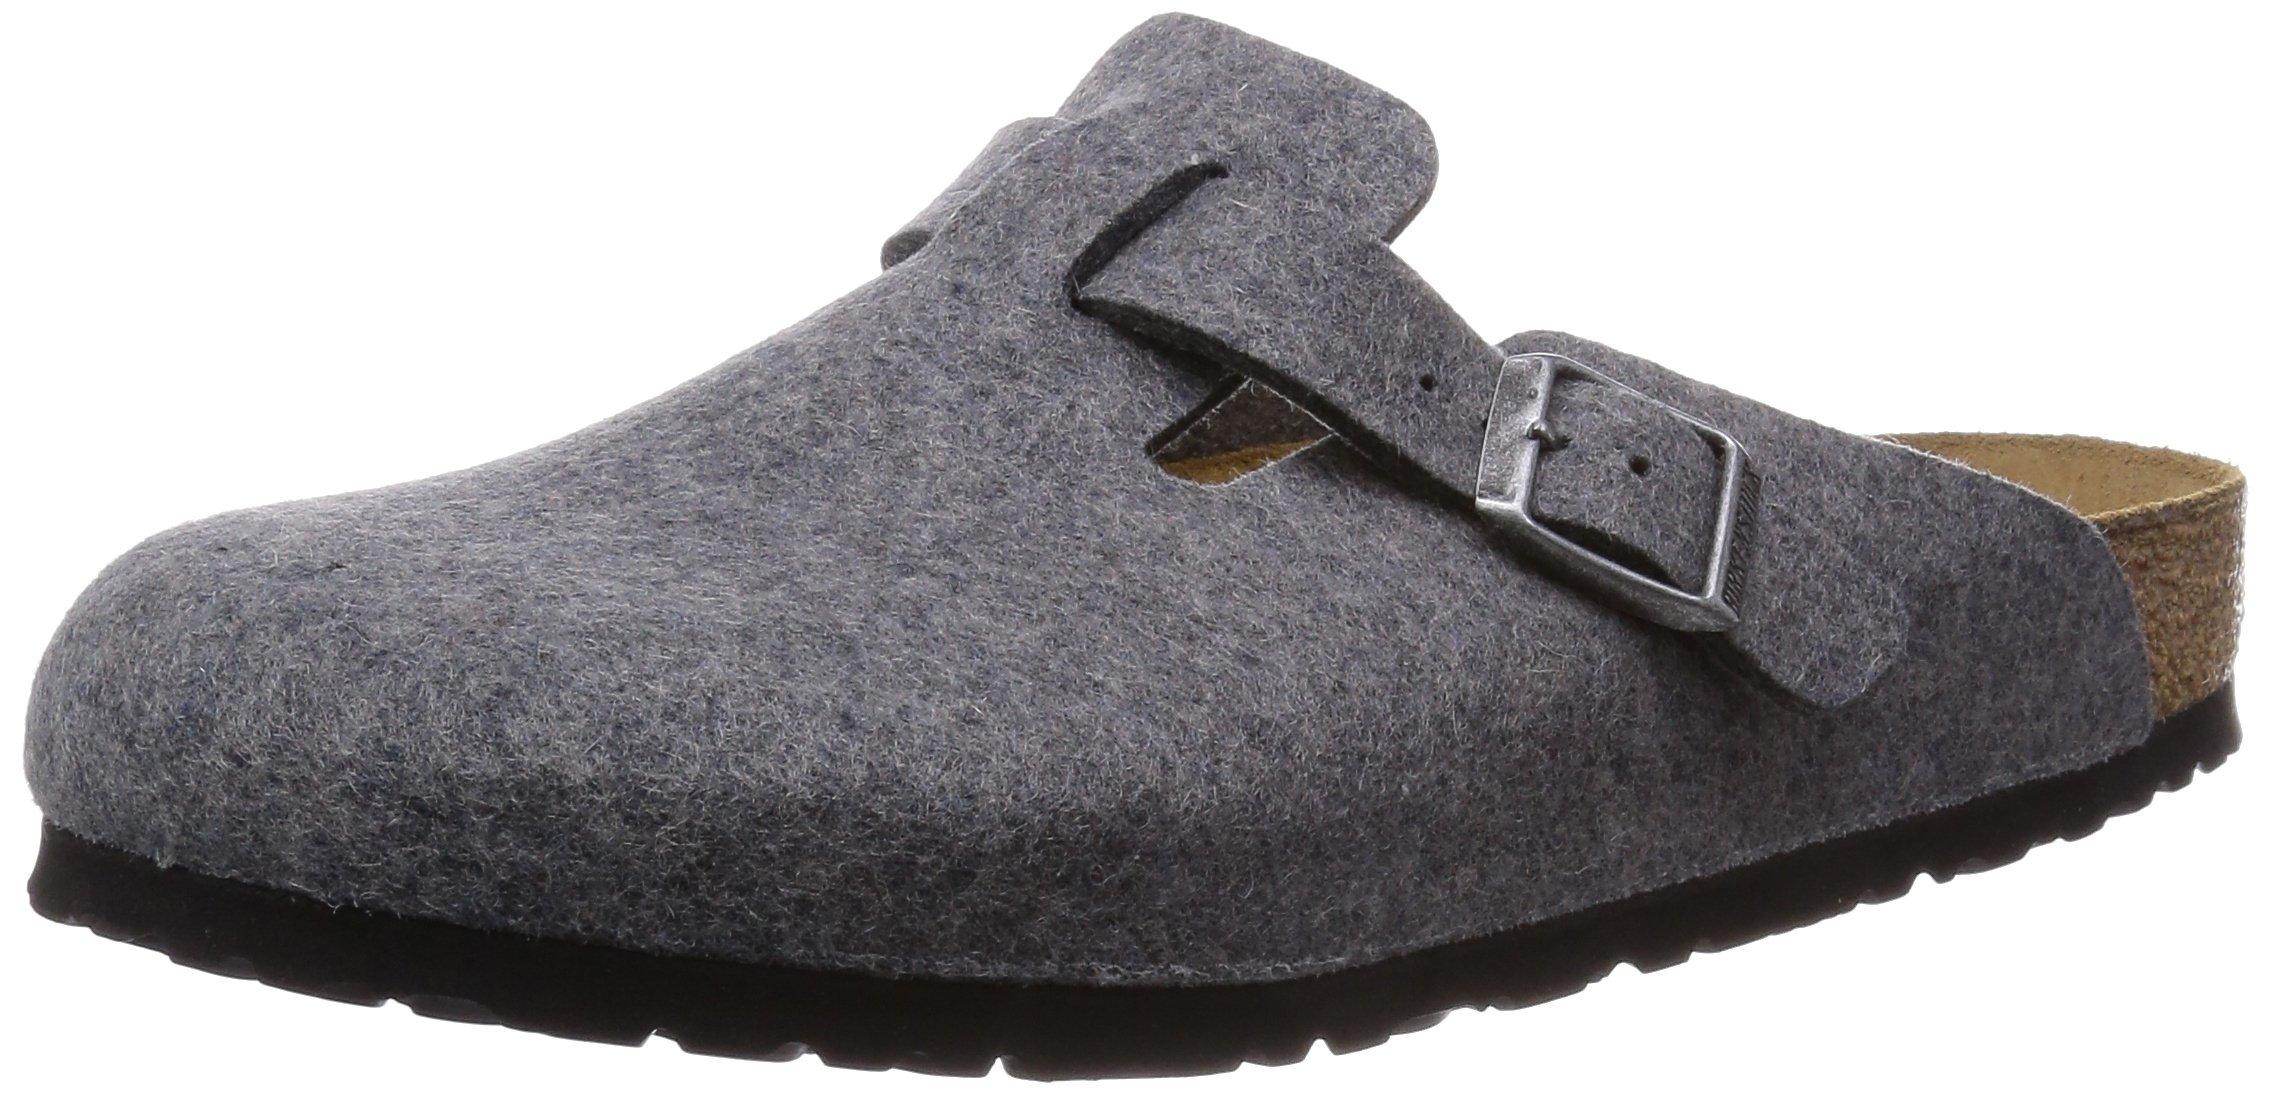 Birkenstock Boston 160361 - Grey (Textile) Womens Clogs 42 EU